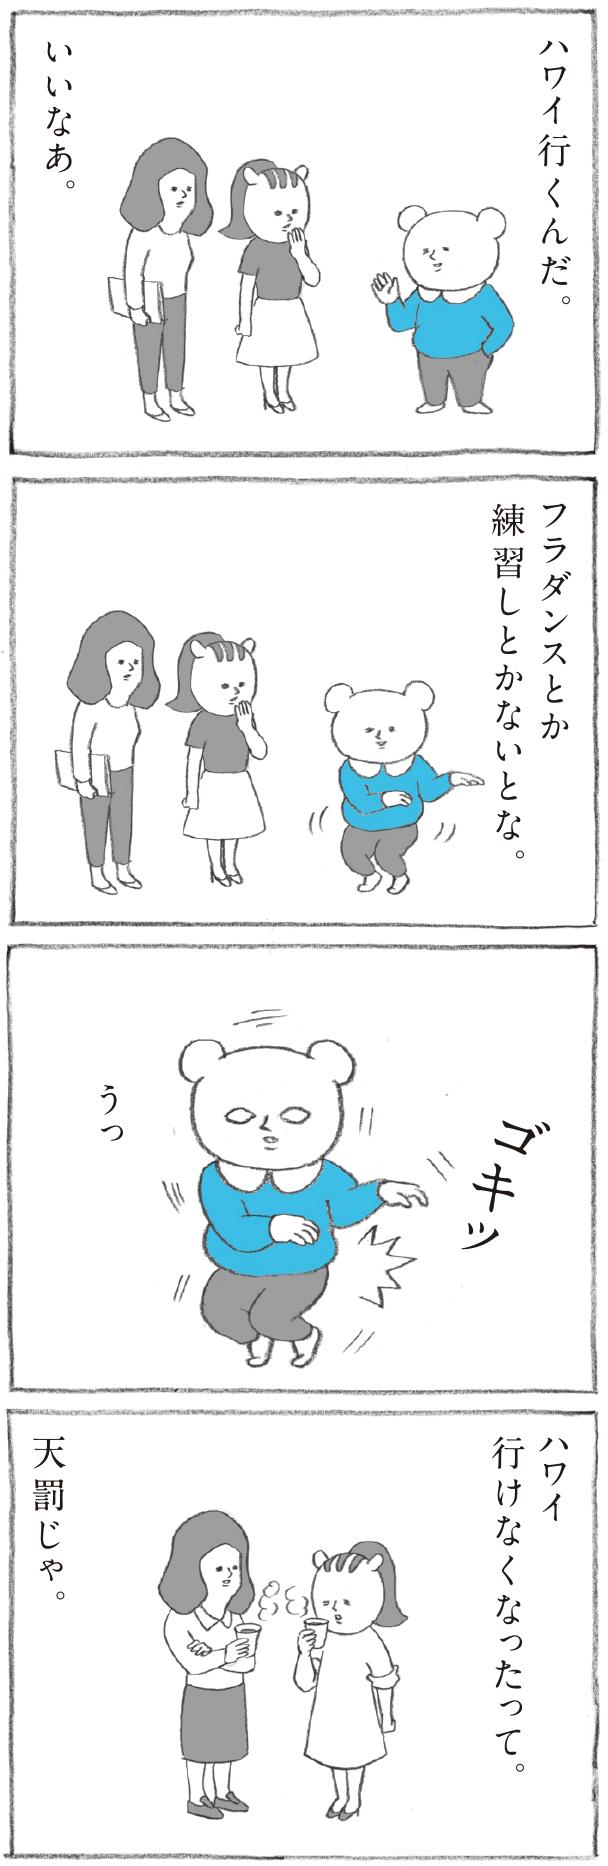 Hanako 1173号:おかわり自由